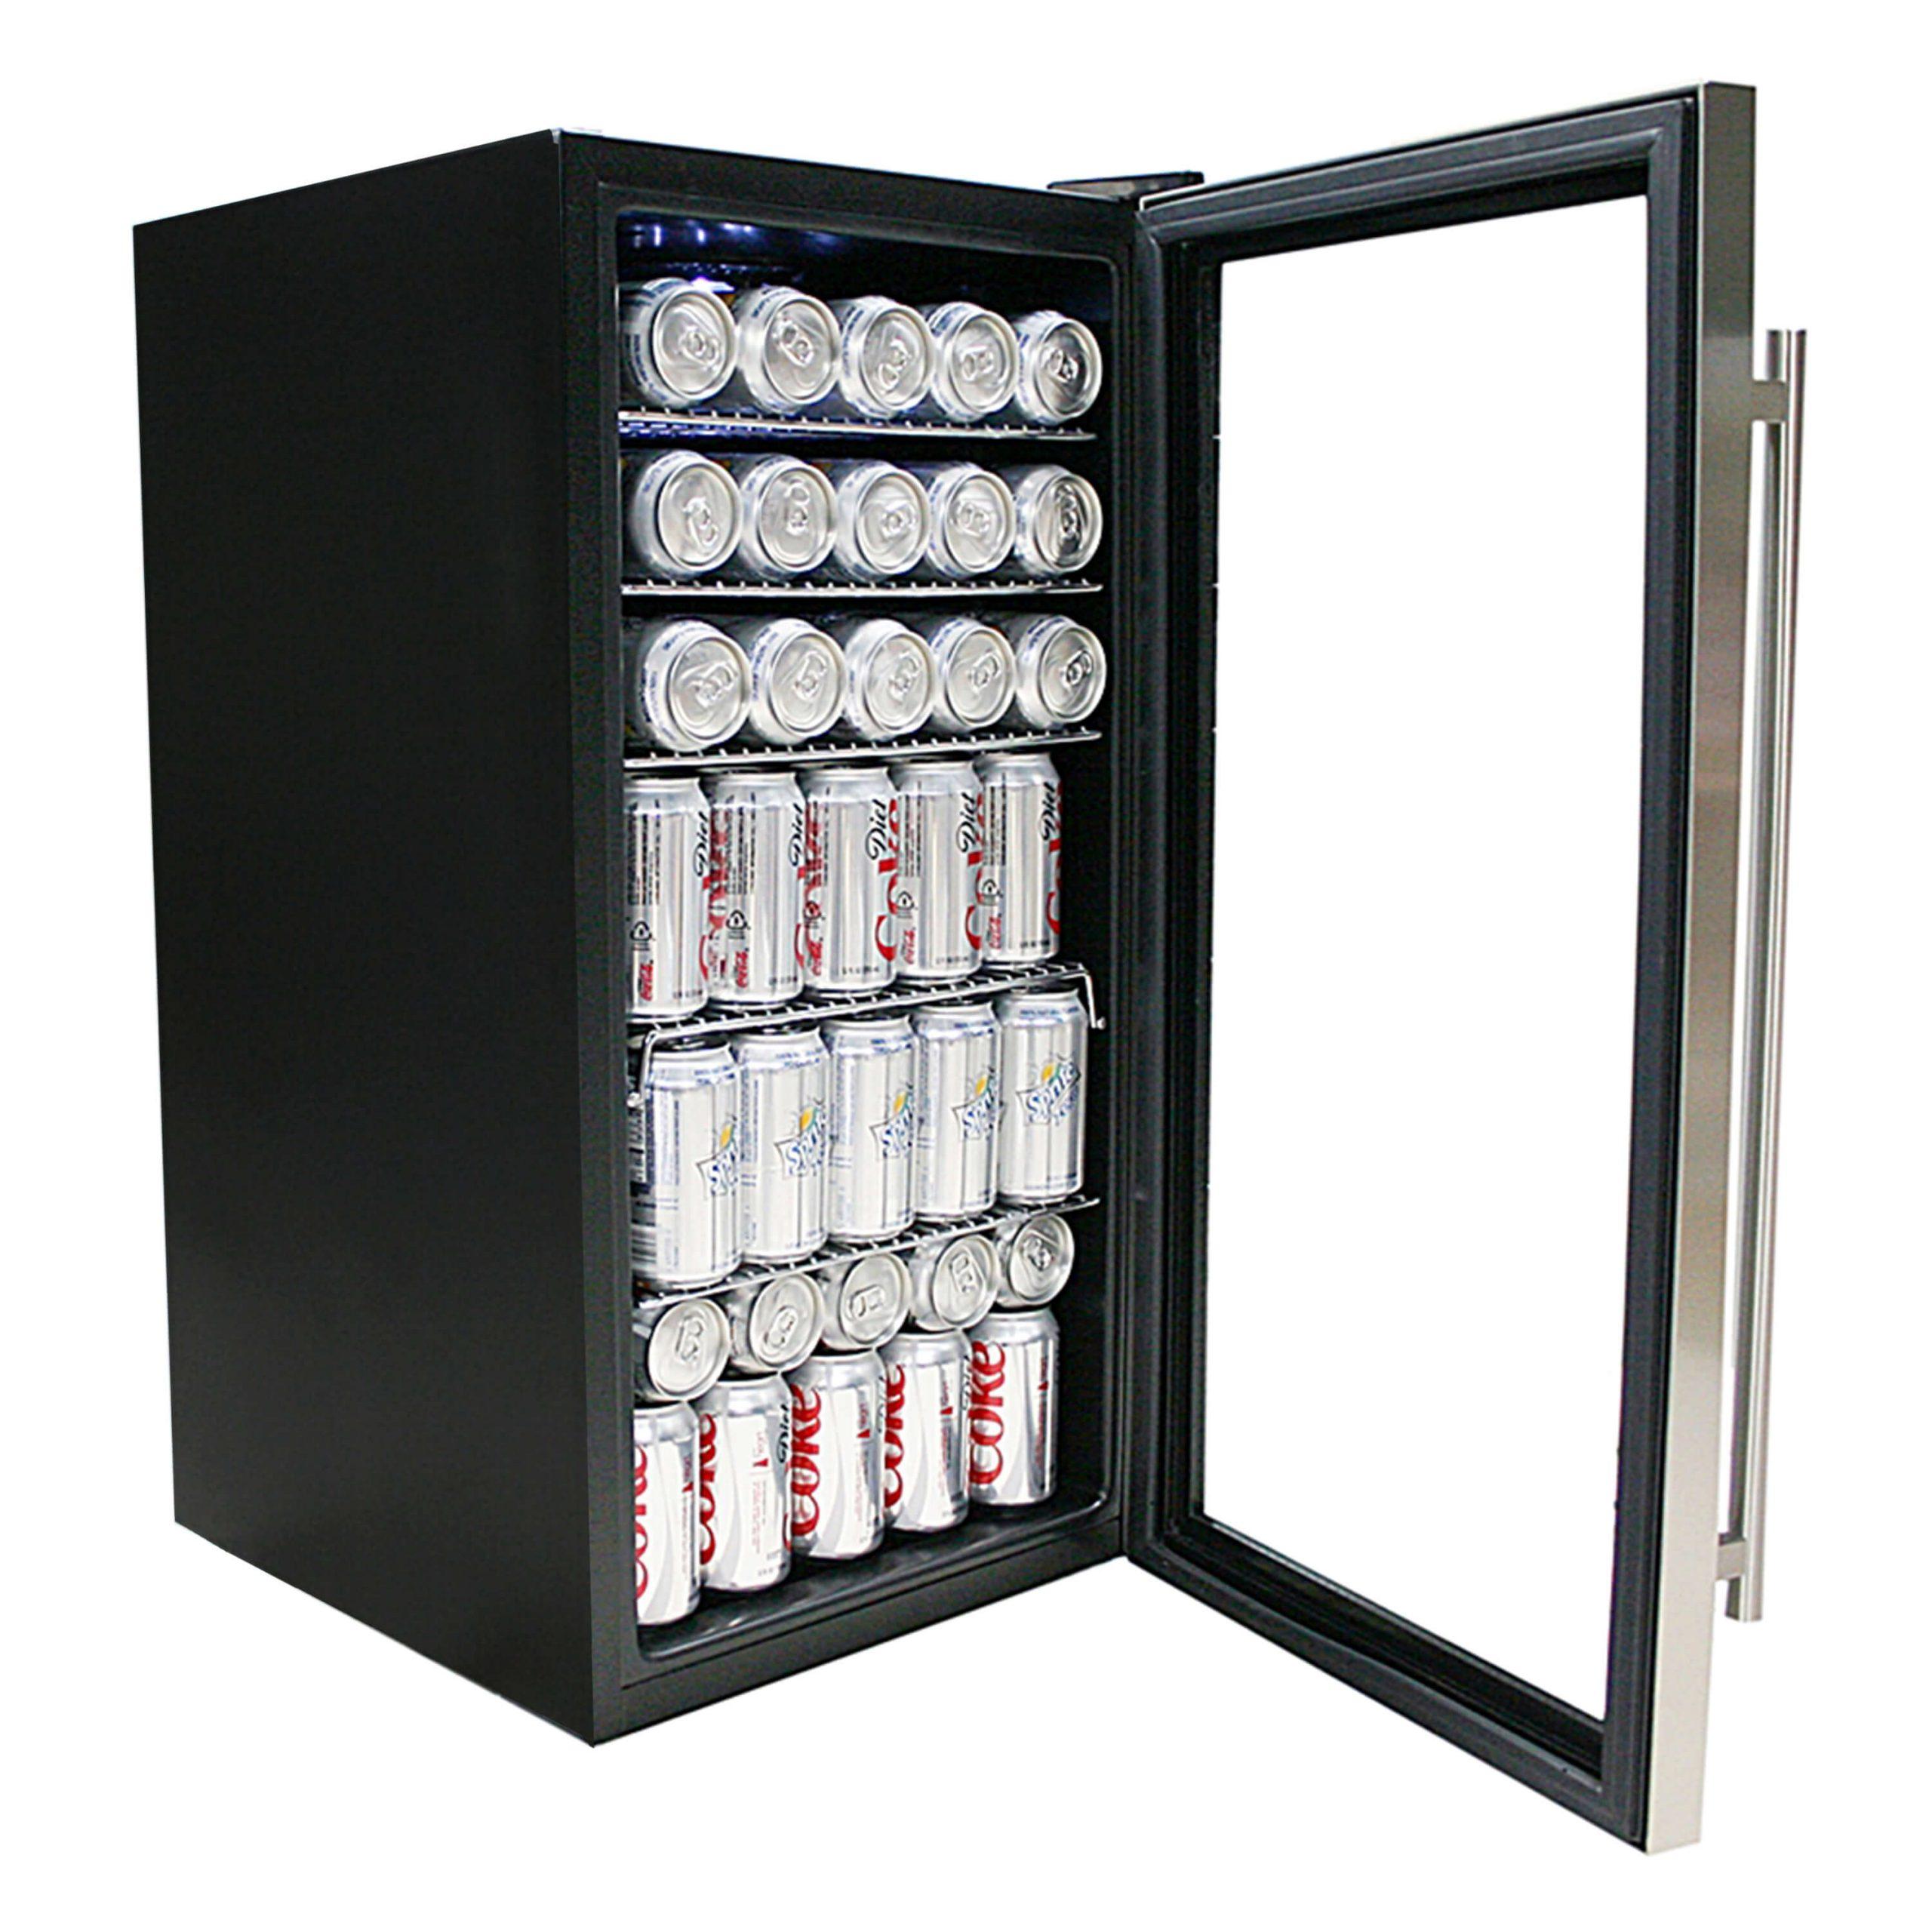 Whynter BR-130SB Beverage Refrigerator Specs 2021